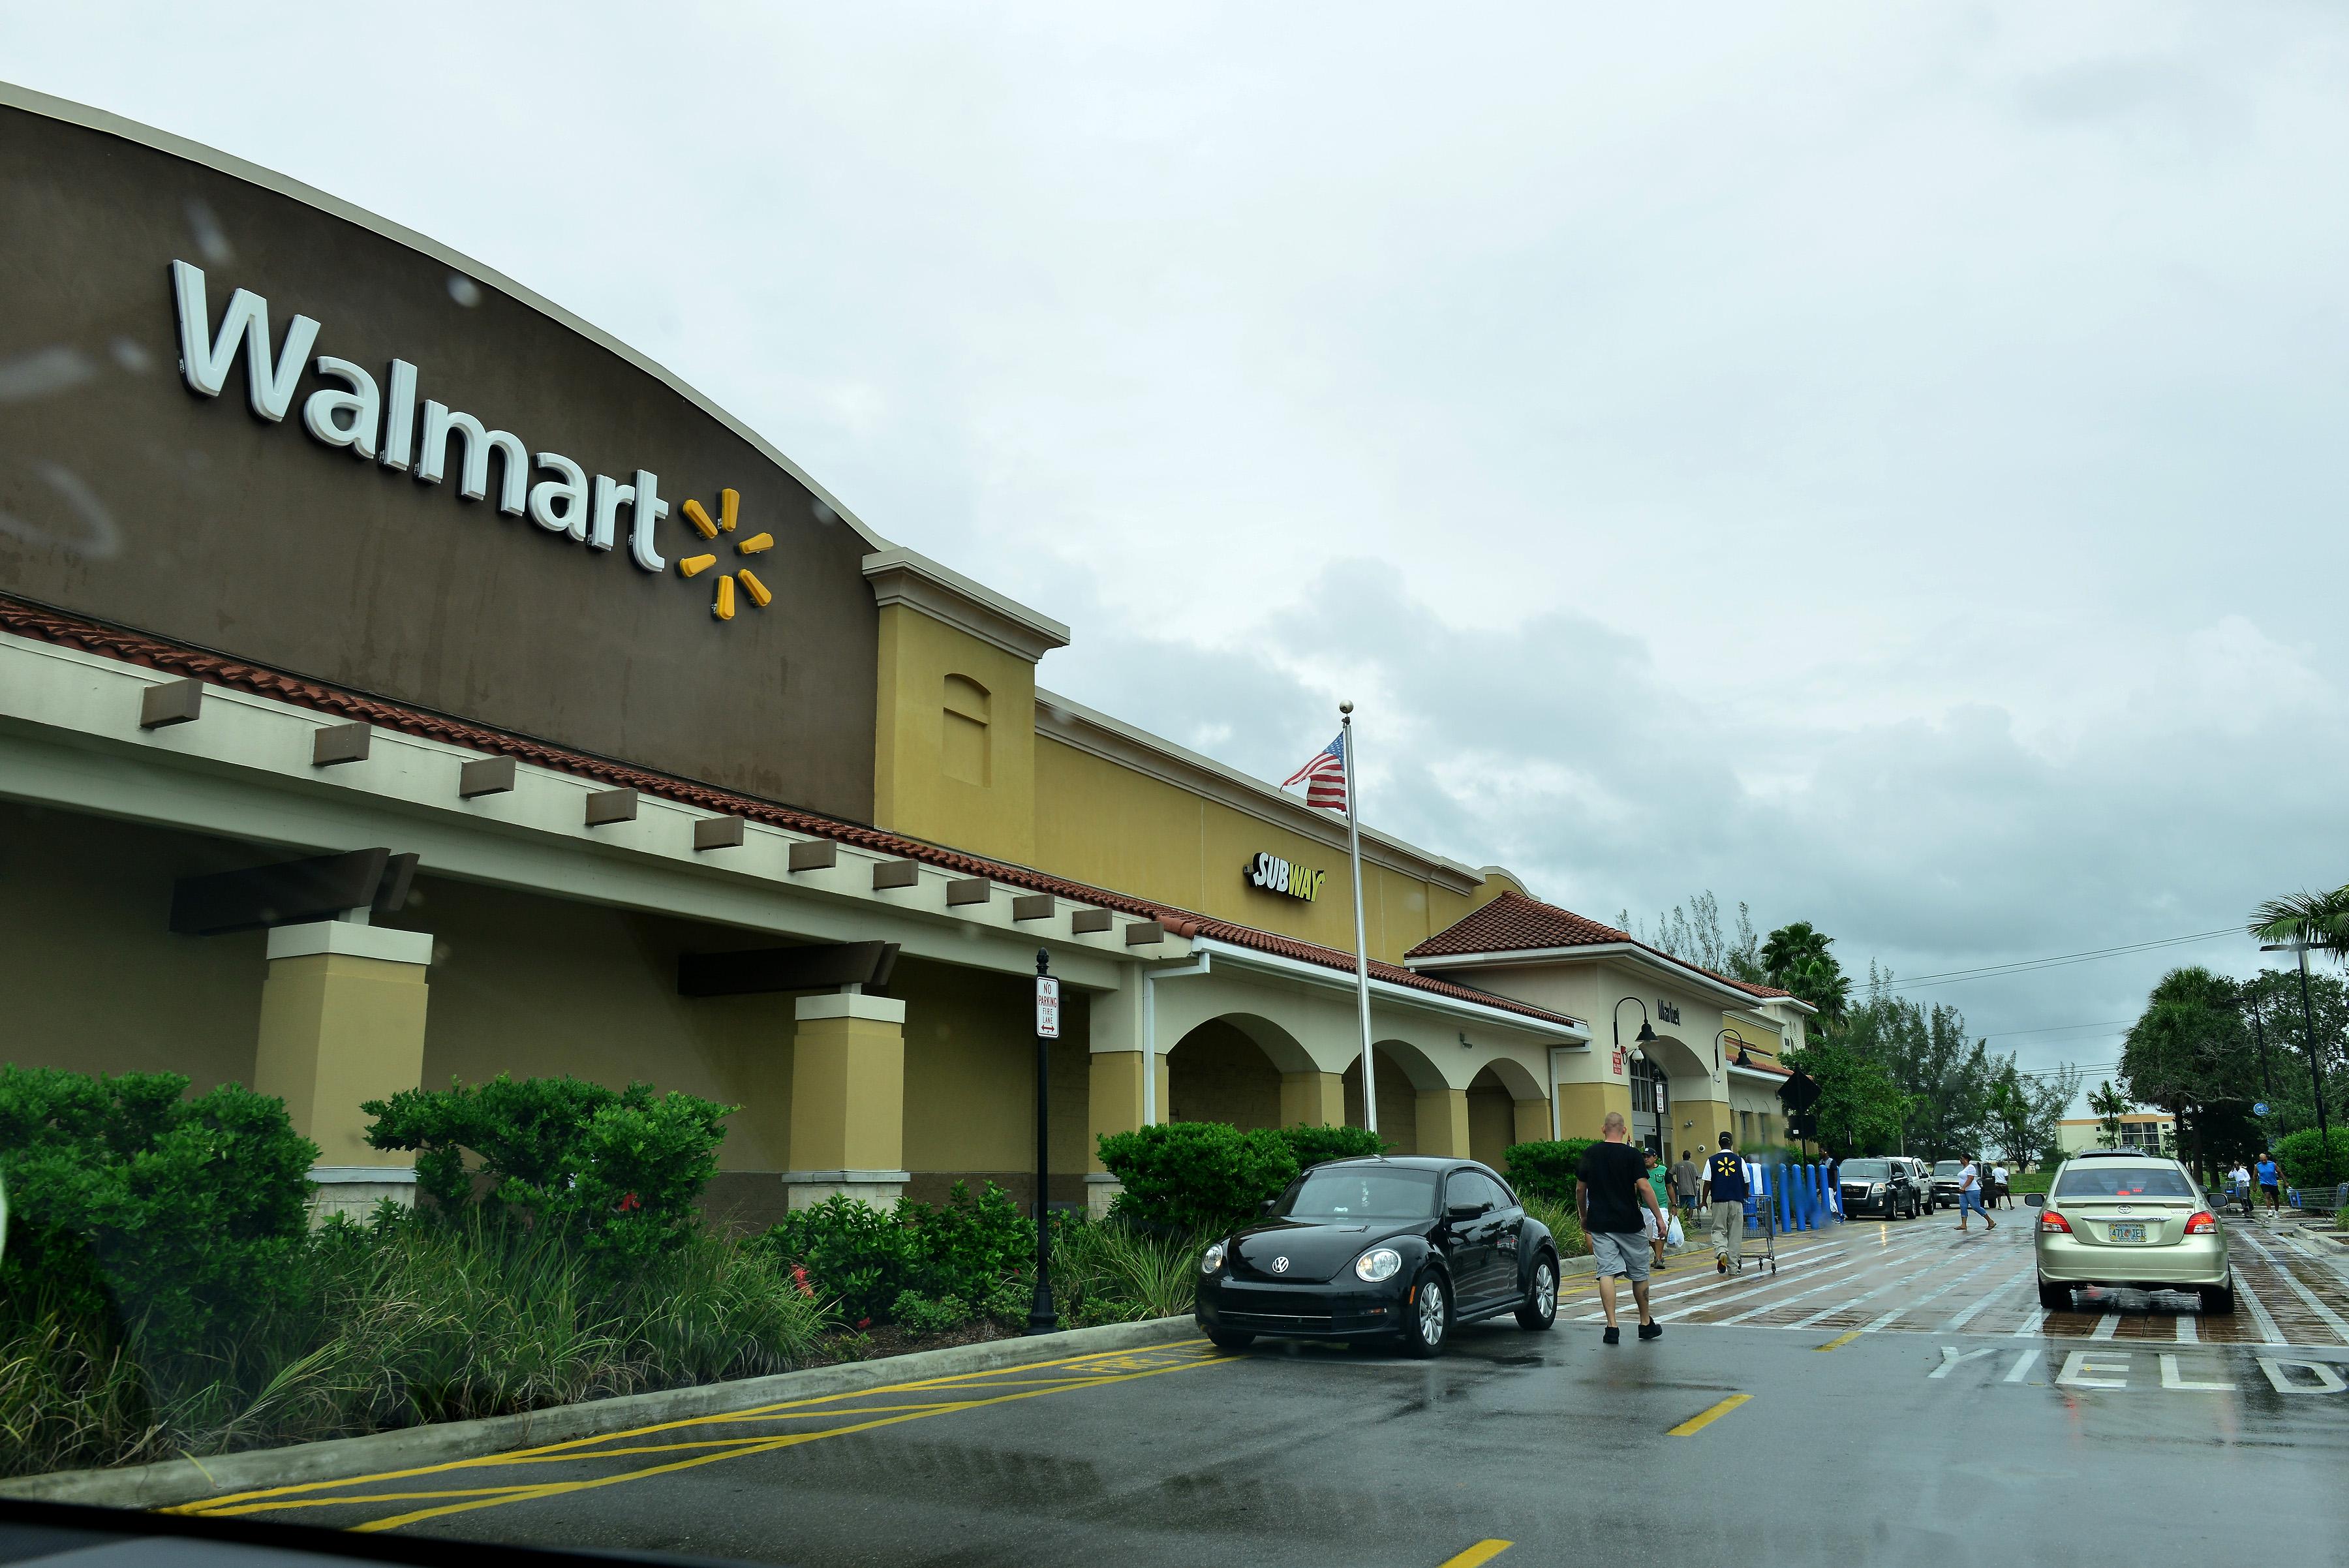 Florida prepares for Hurricane Matthew